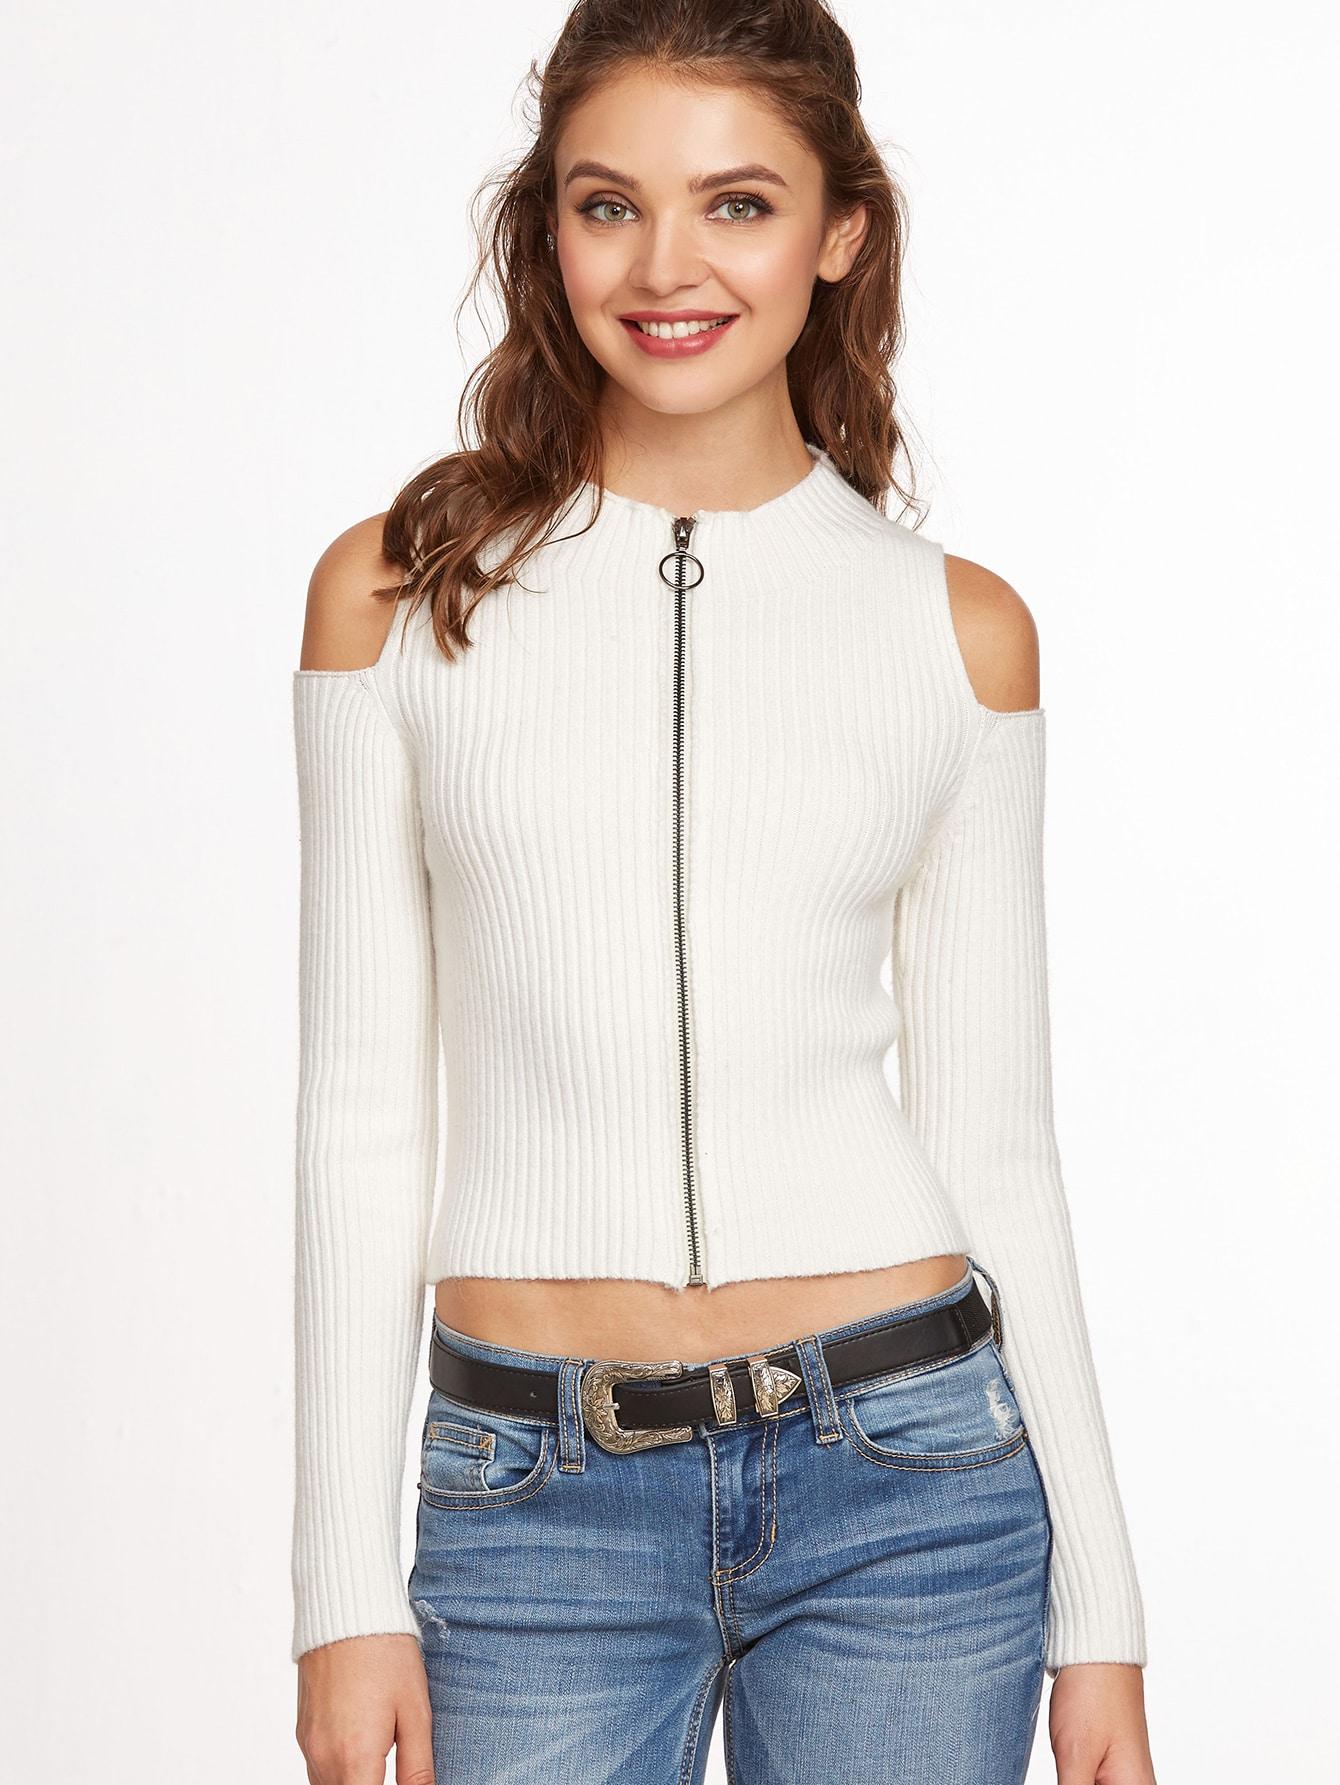 sweater161111450_2